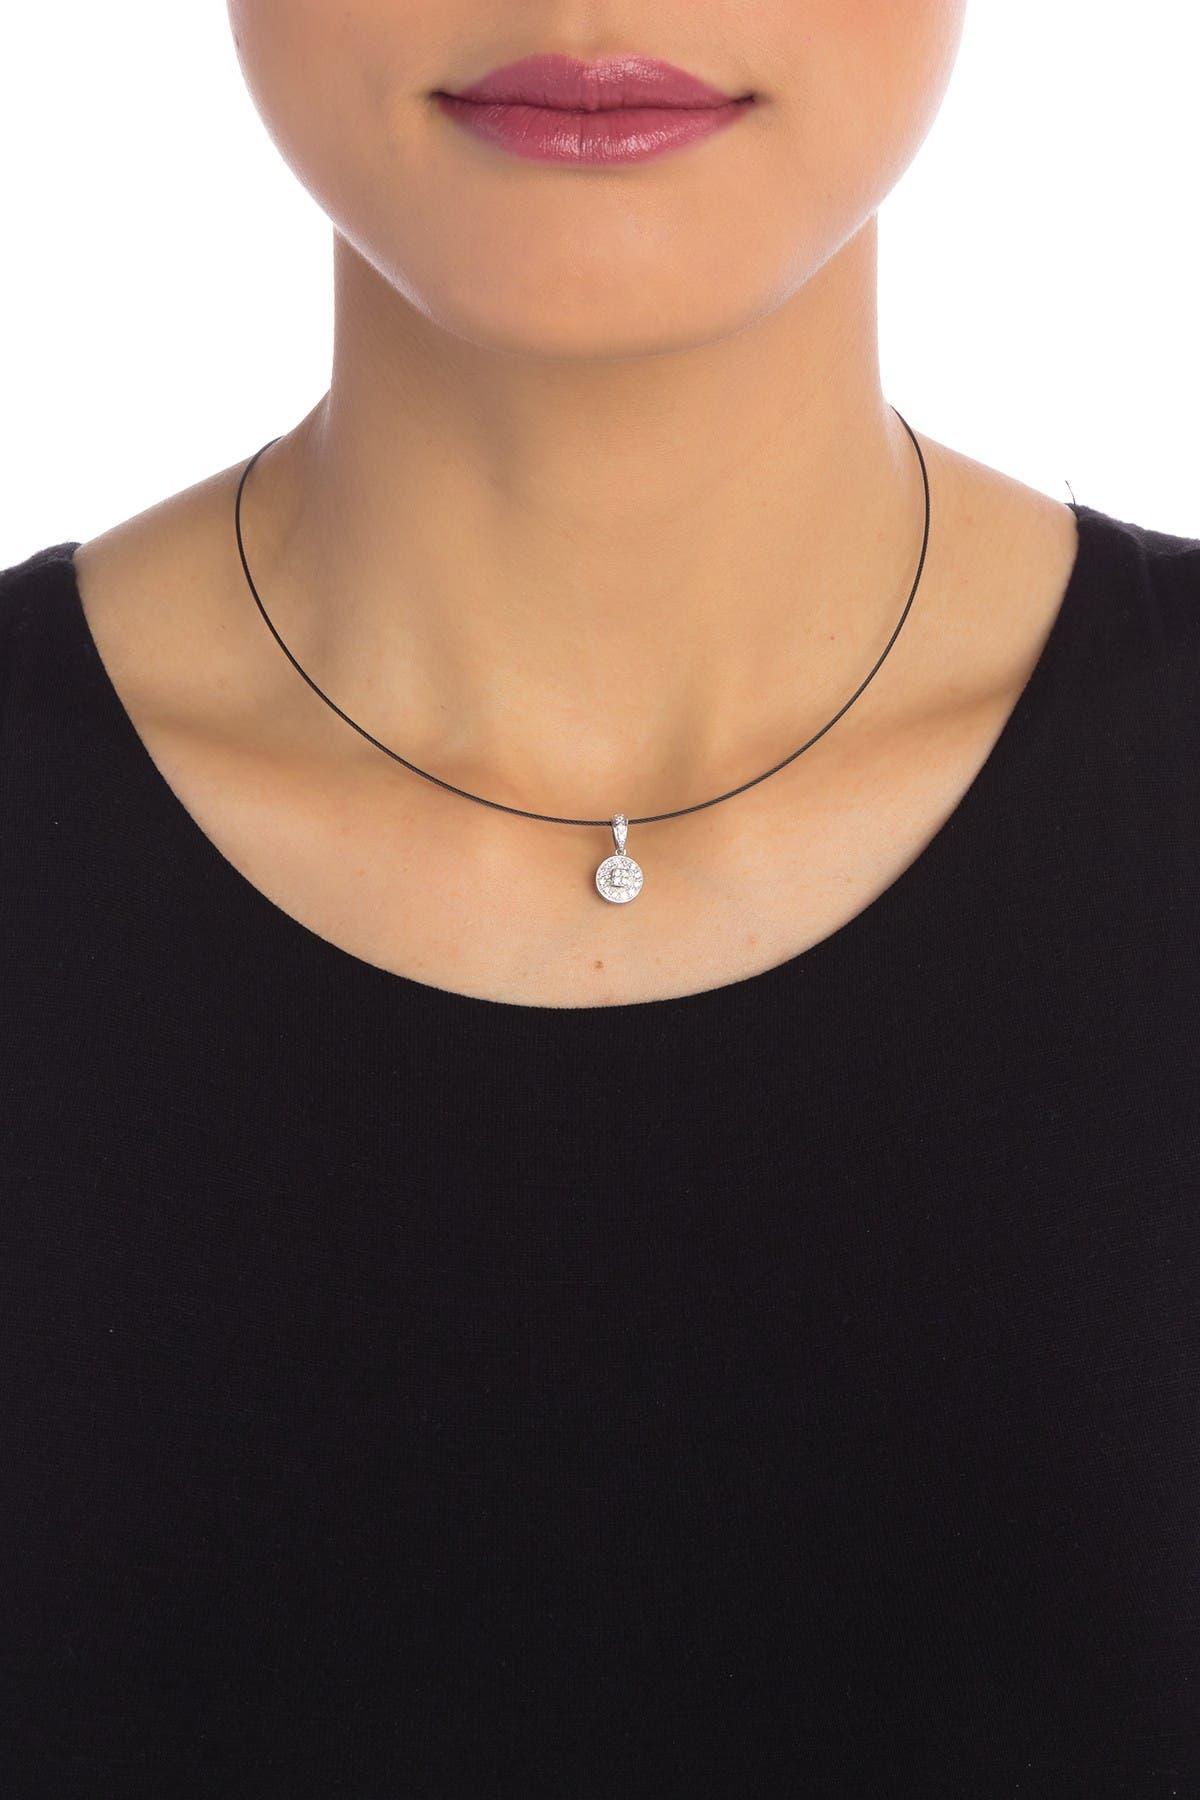 Image of ALOR 18K White Gold Diamond Pendant Necklace - 0.17 ctw